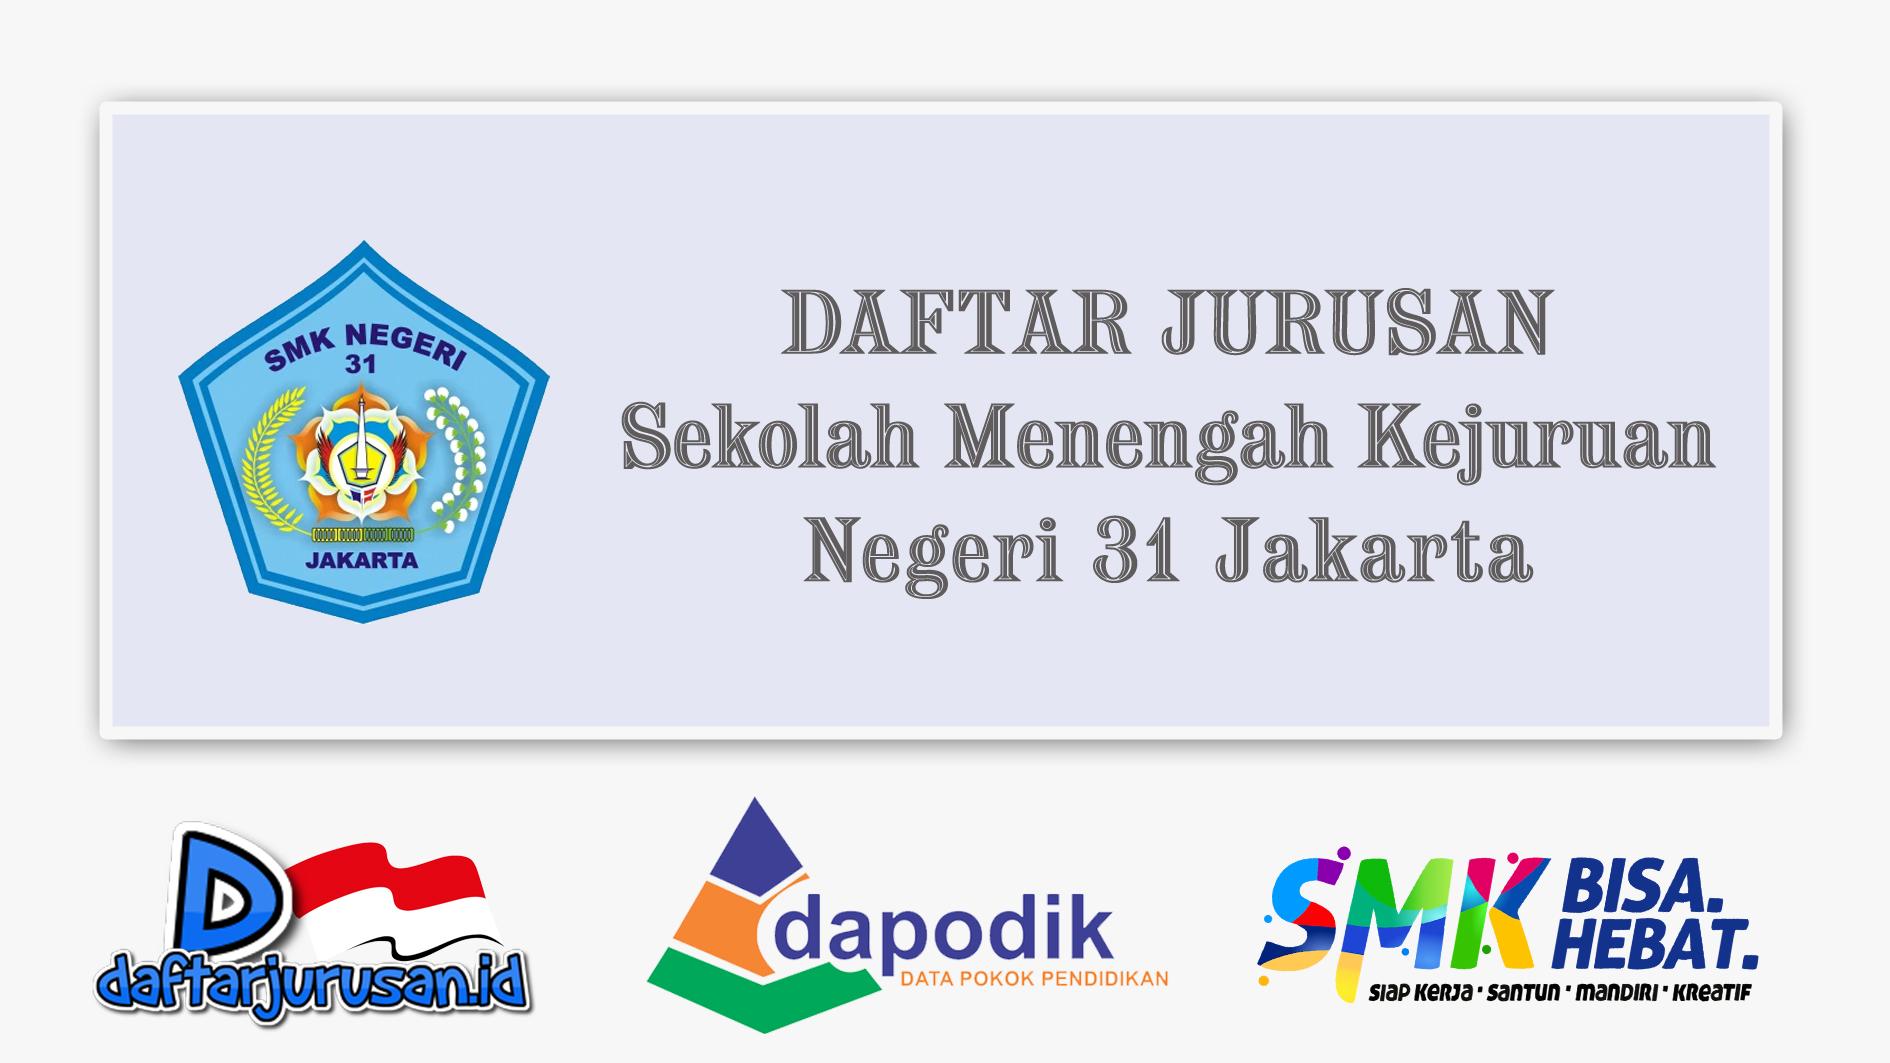 Daftar Jurusan SMK Negeri 31 Jakarta Pusat